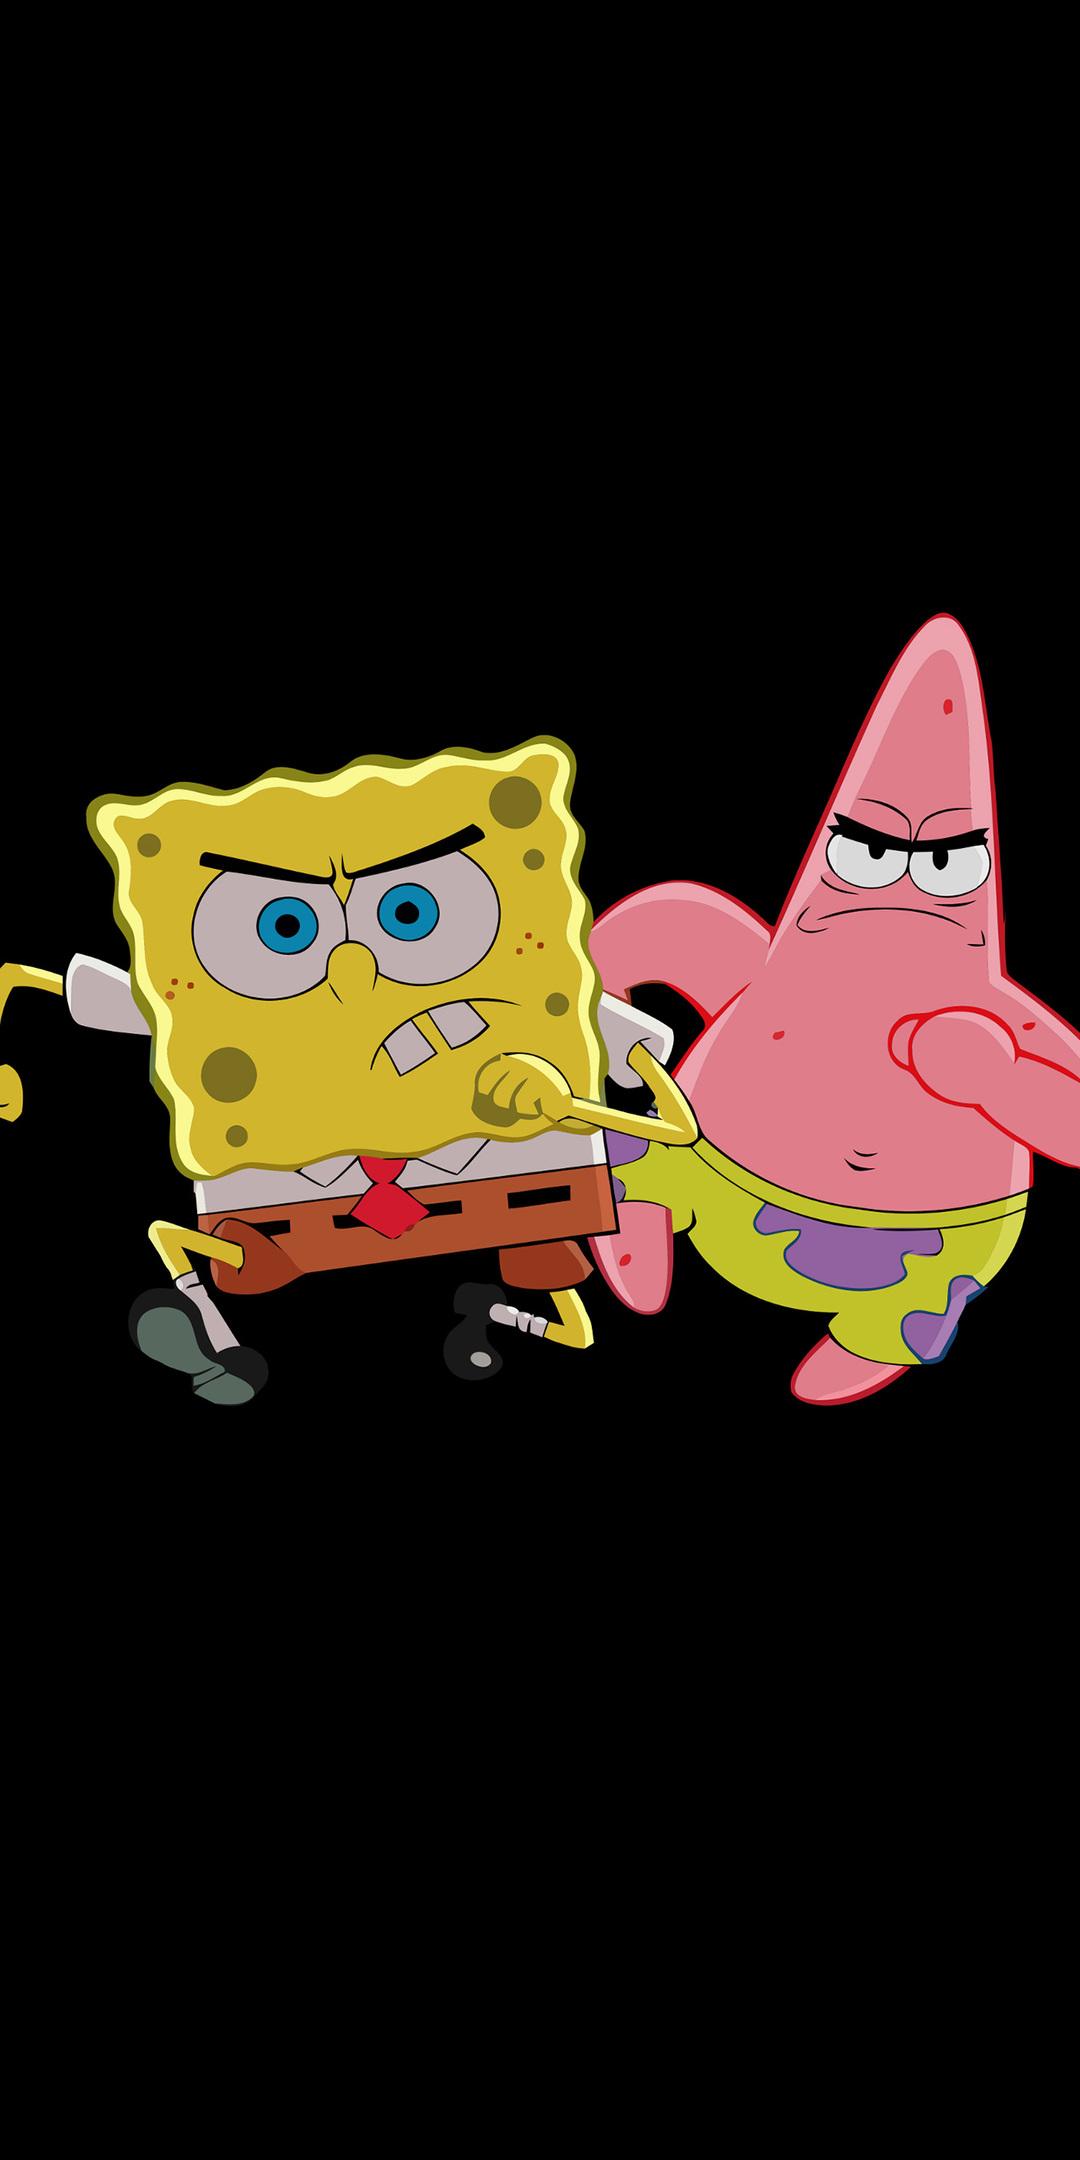 patrick-star-and-spongebob-1c.jpg